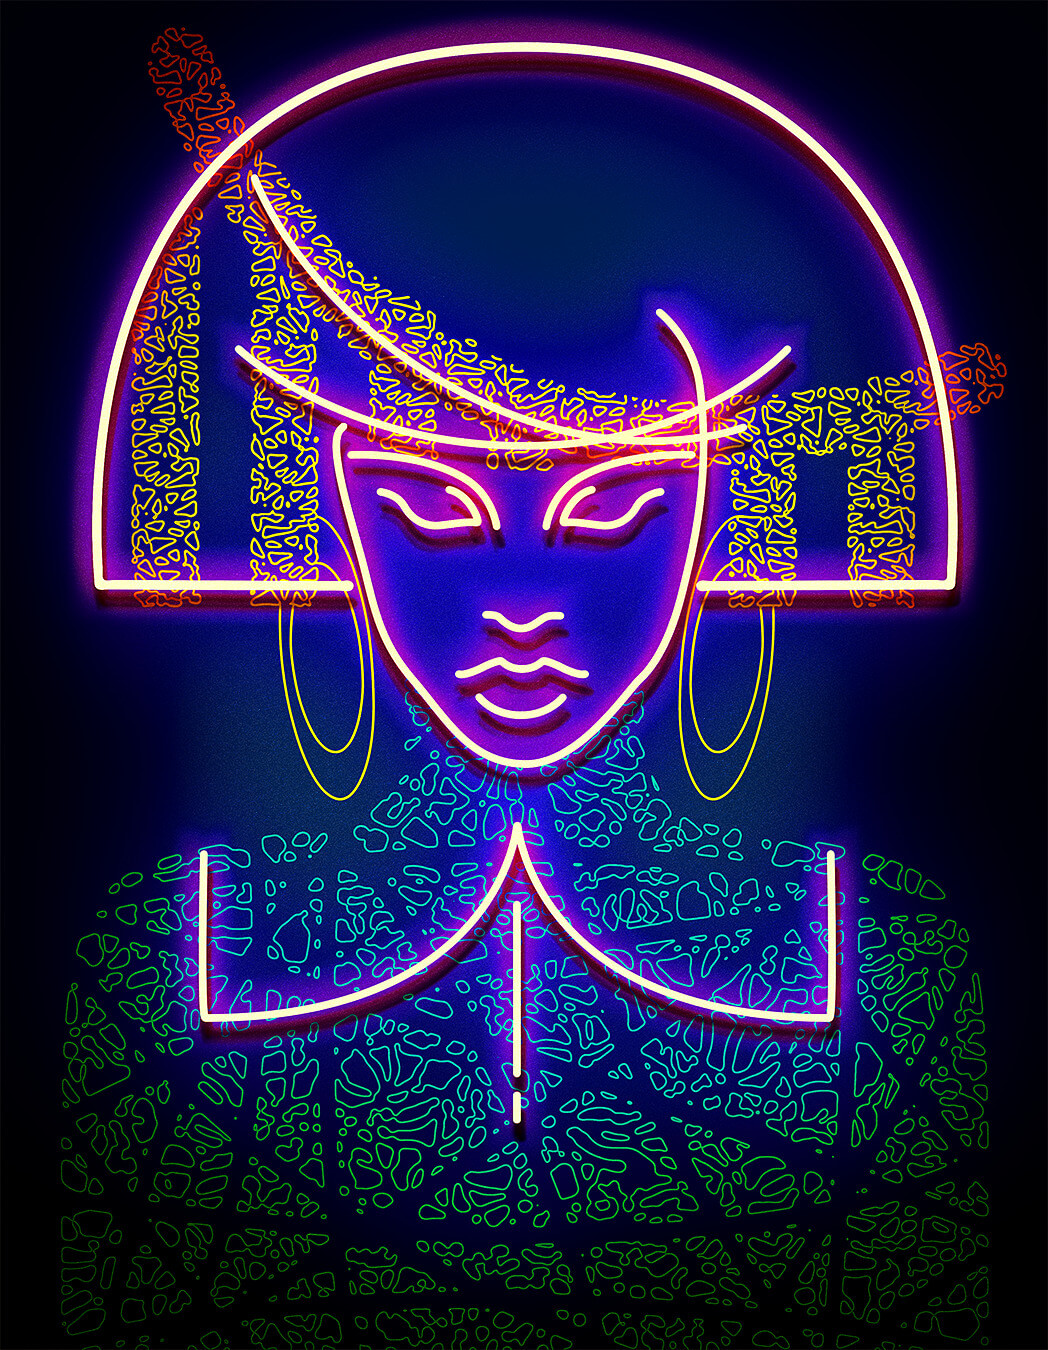 Mintsquare_Selected_Neon infused Imagery_Vasya Kolotusha